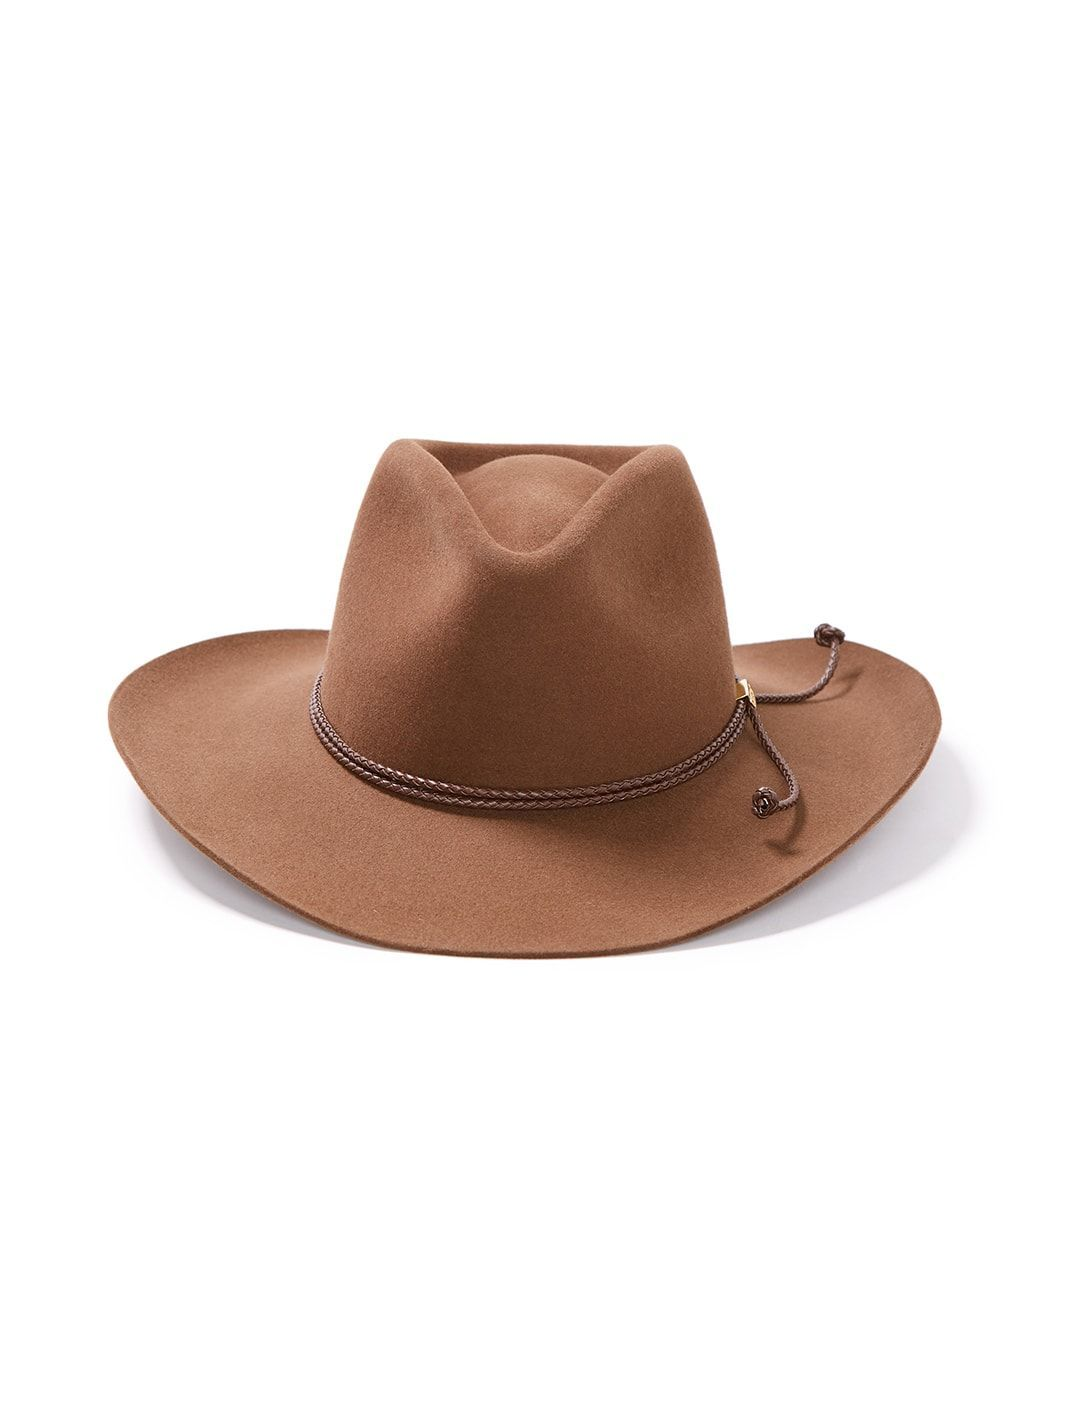 cd41f7bd144dd6 Stetson Carson 6X Cowboy Hat | Cowboy Hats | Cowboy hats, Hats ...